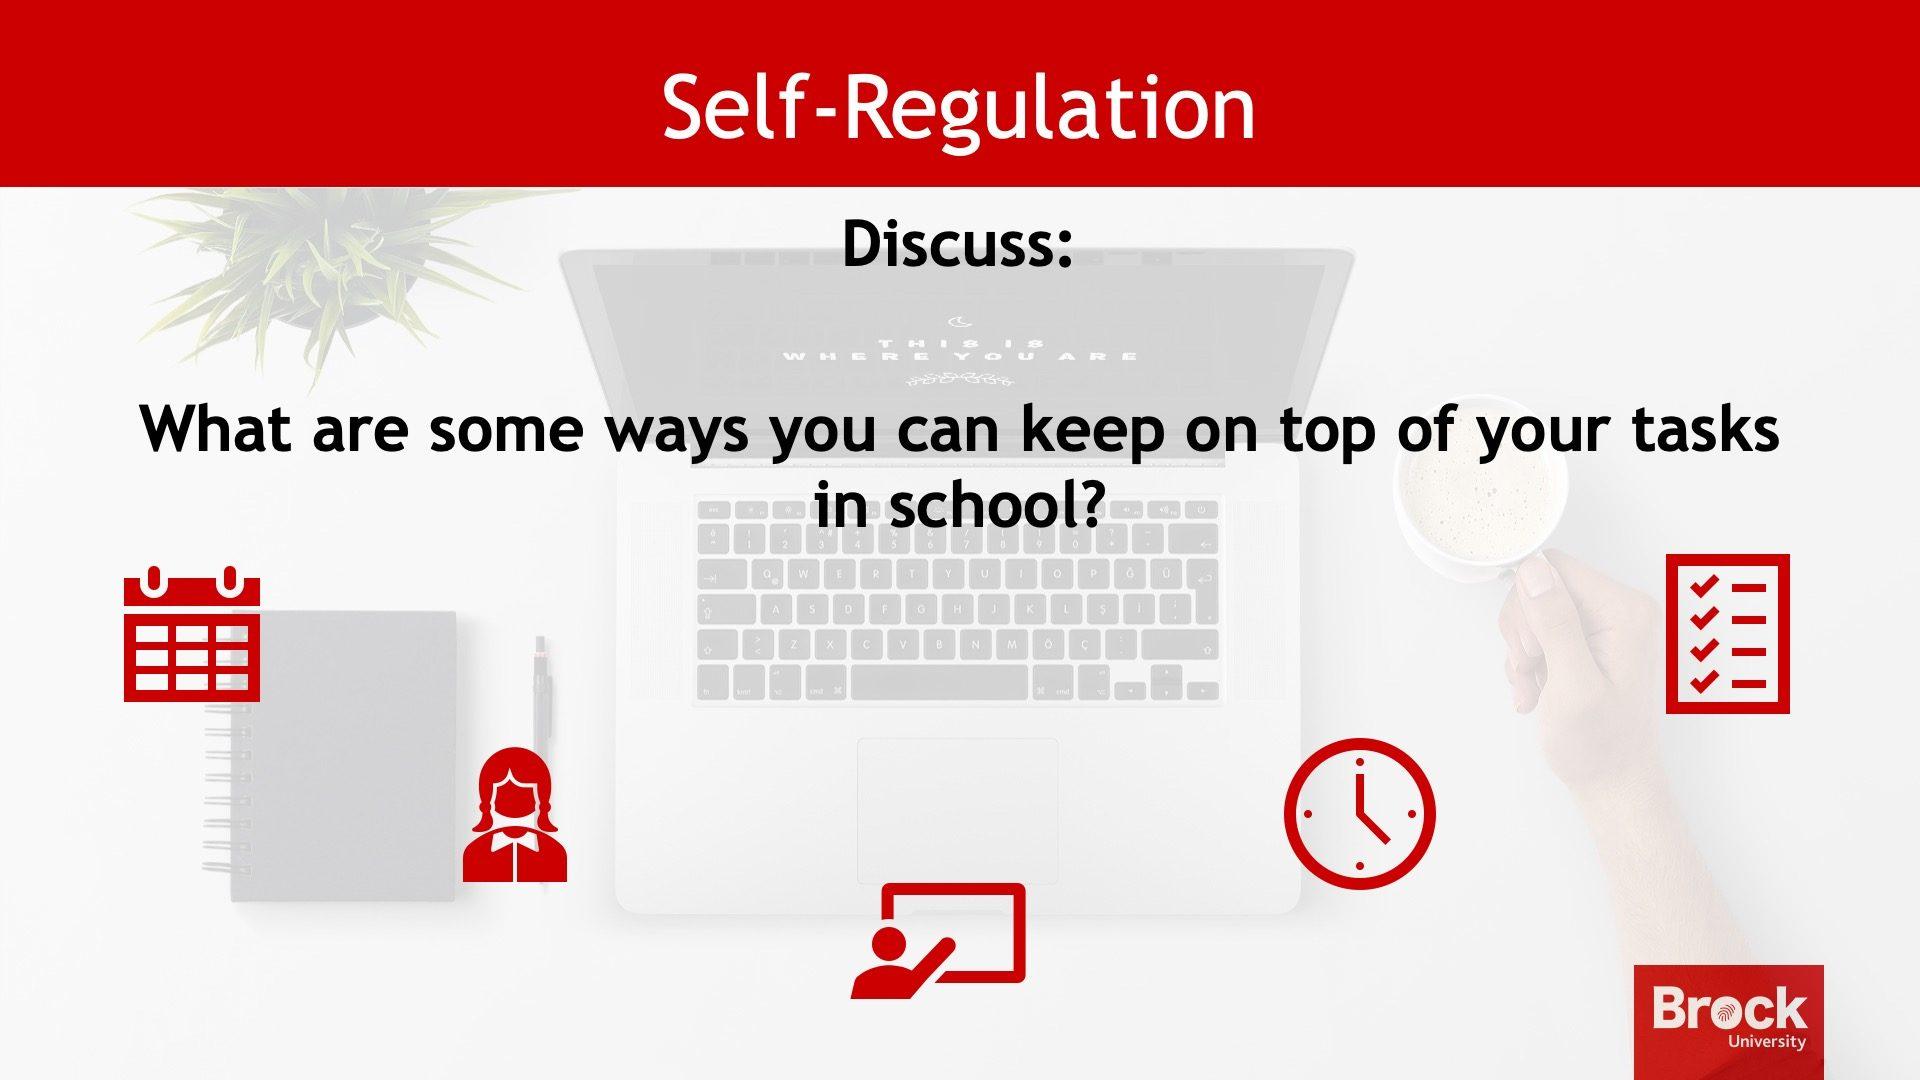 Self-regulation discussion